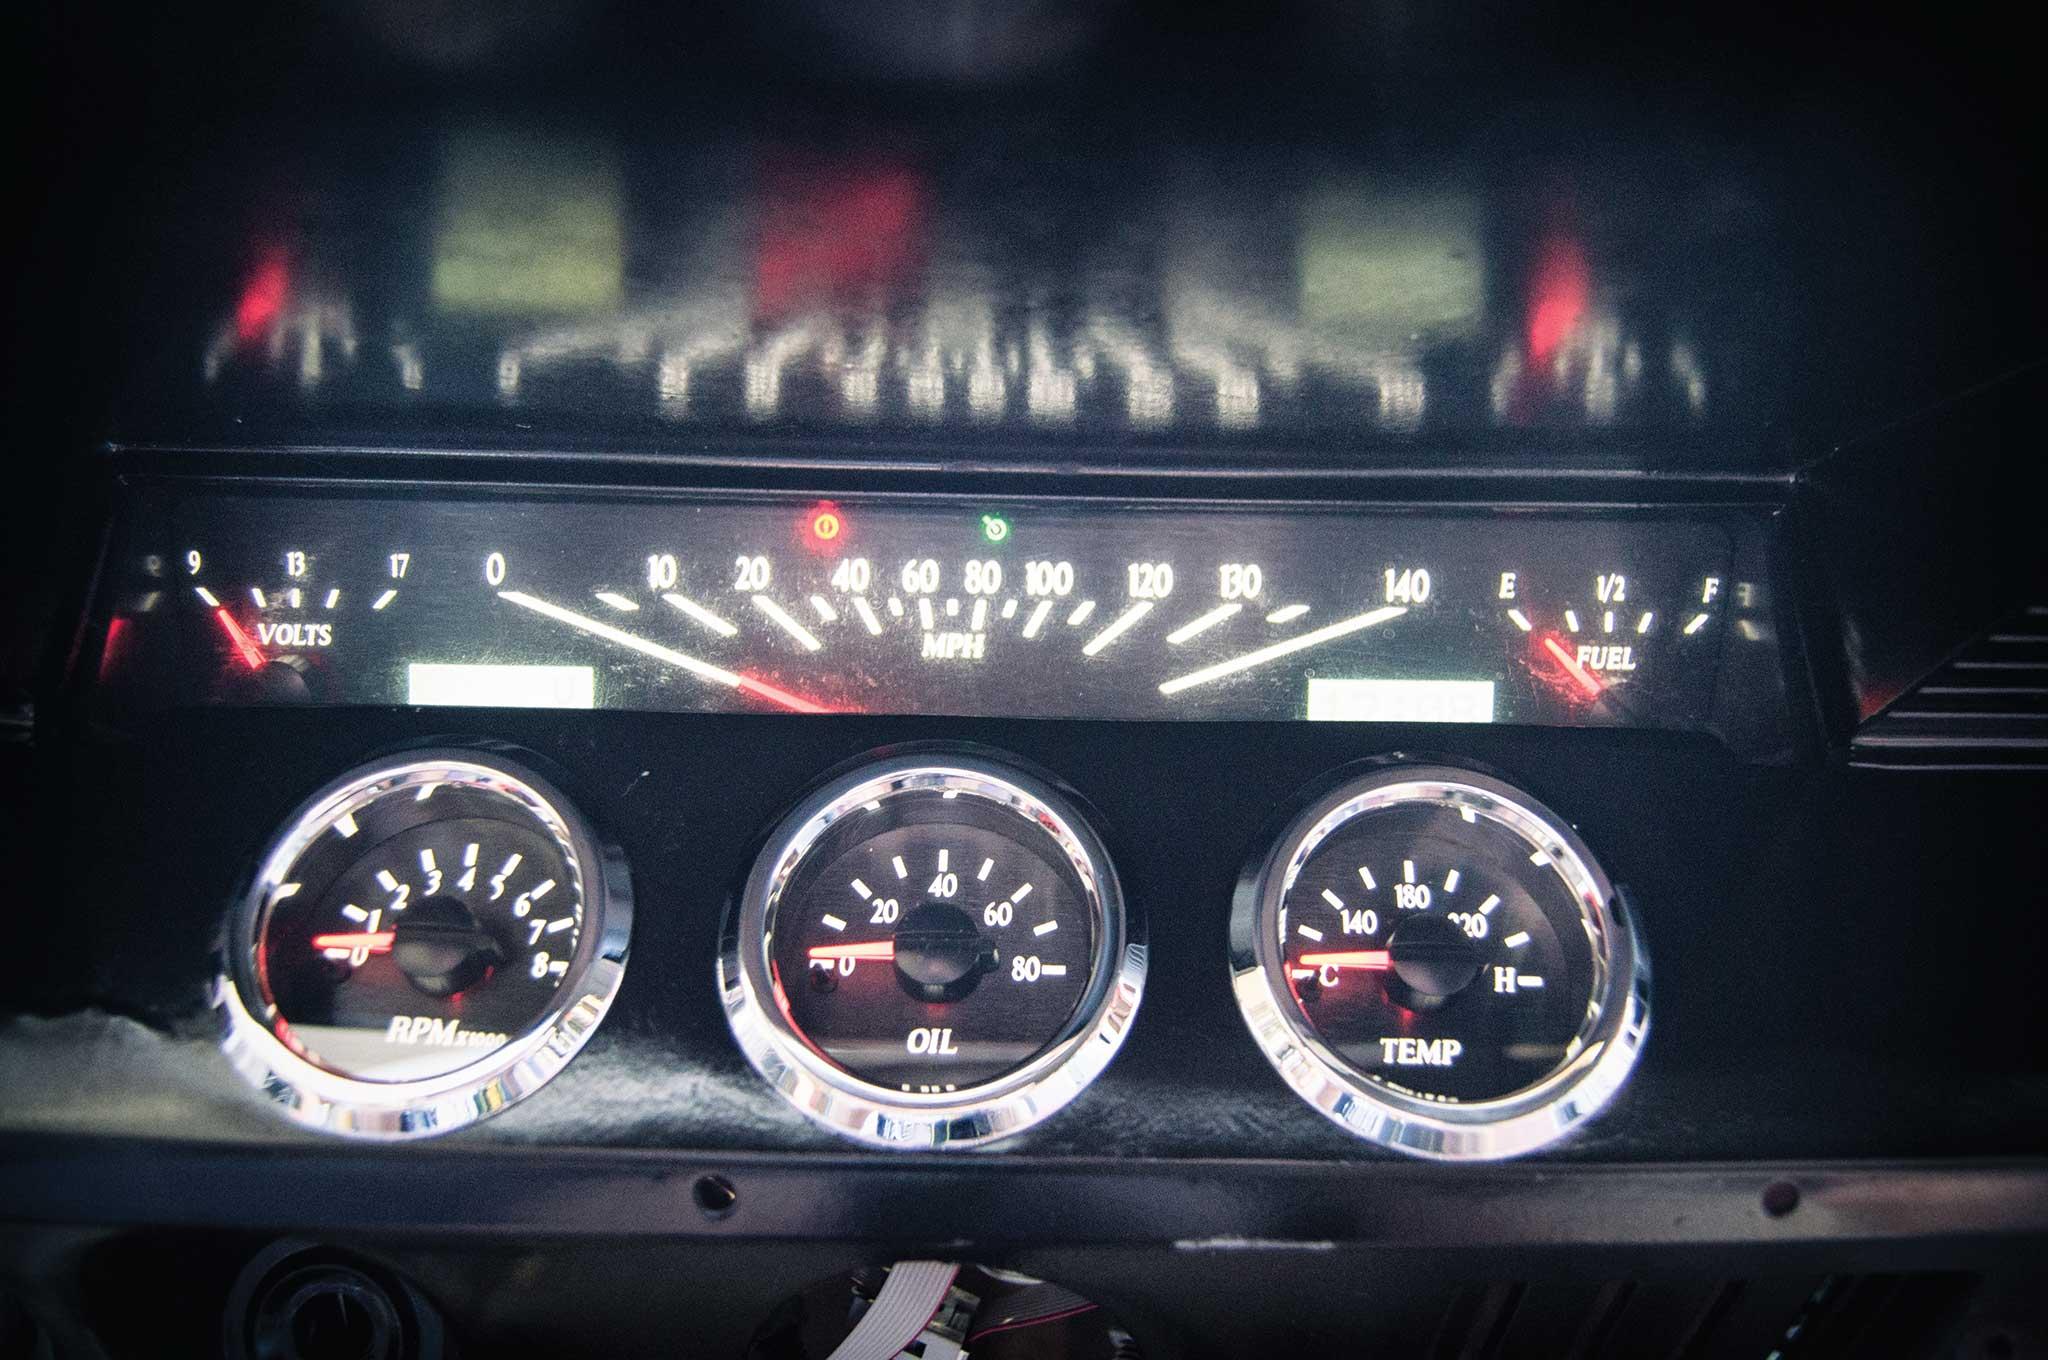 61 Impala Dakota Digital Gauge Led Taillight Install Tach Wiring 9 16